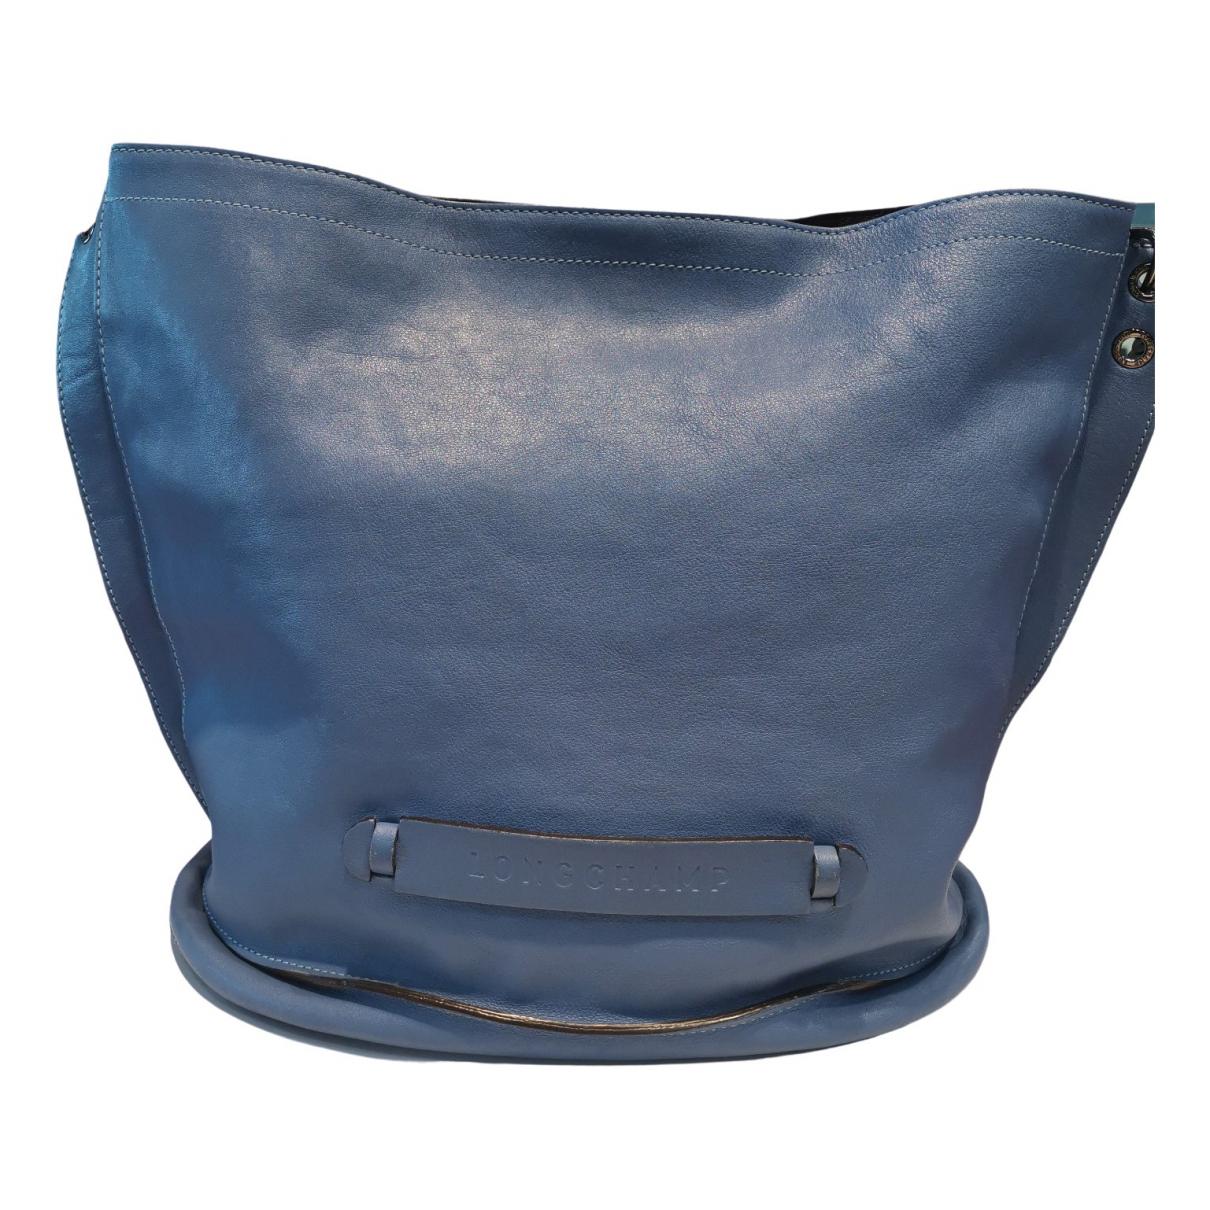 Longchamp 3D Handtasche in  Blau Leder